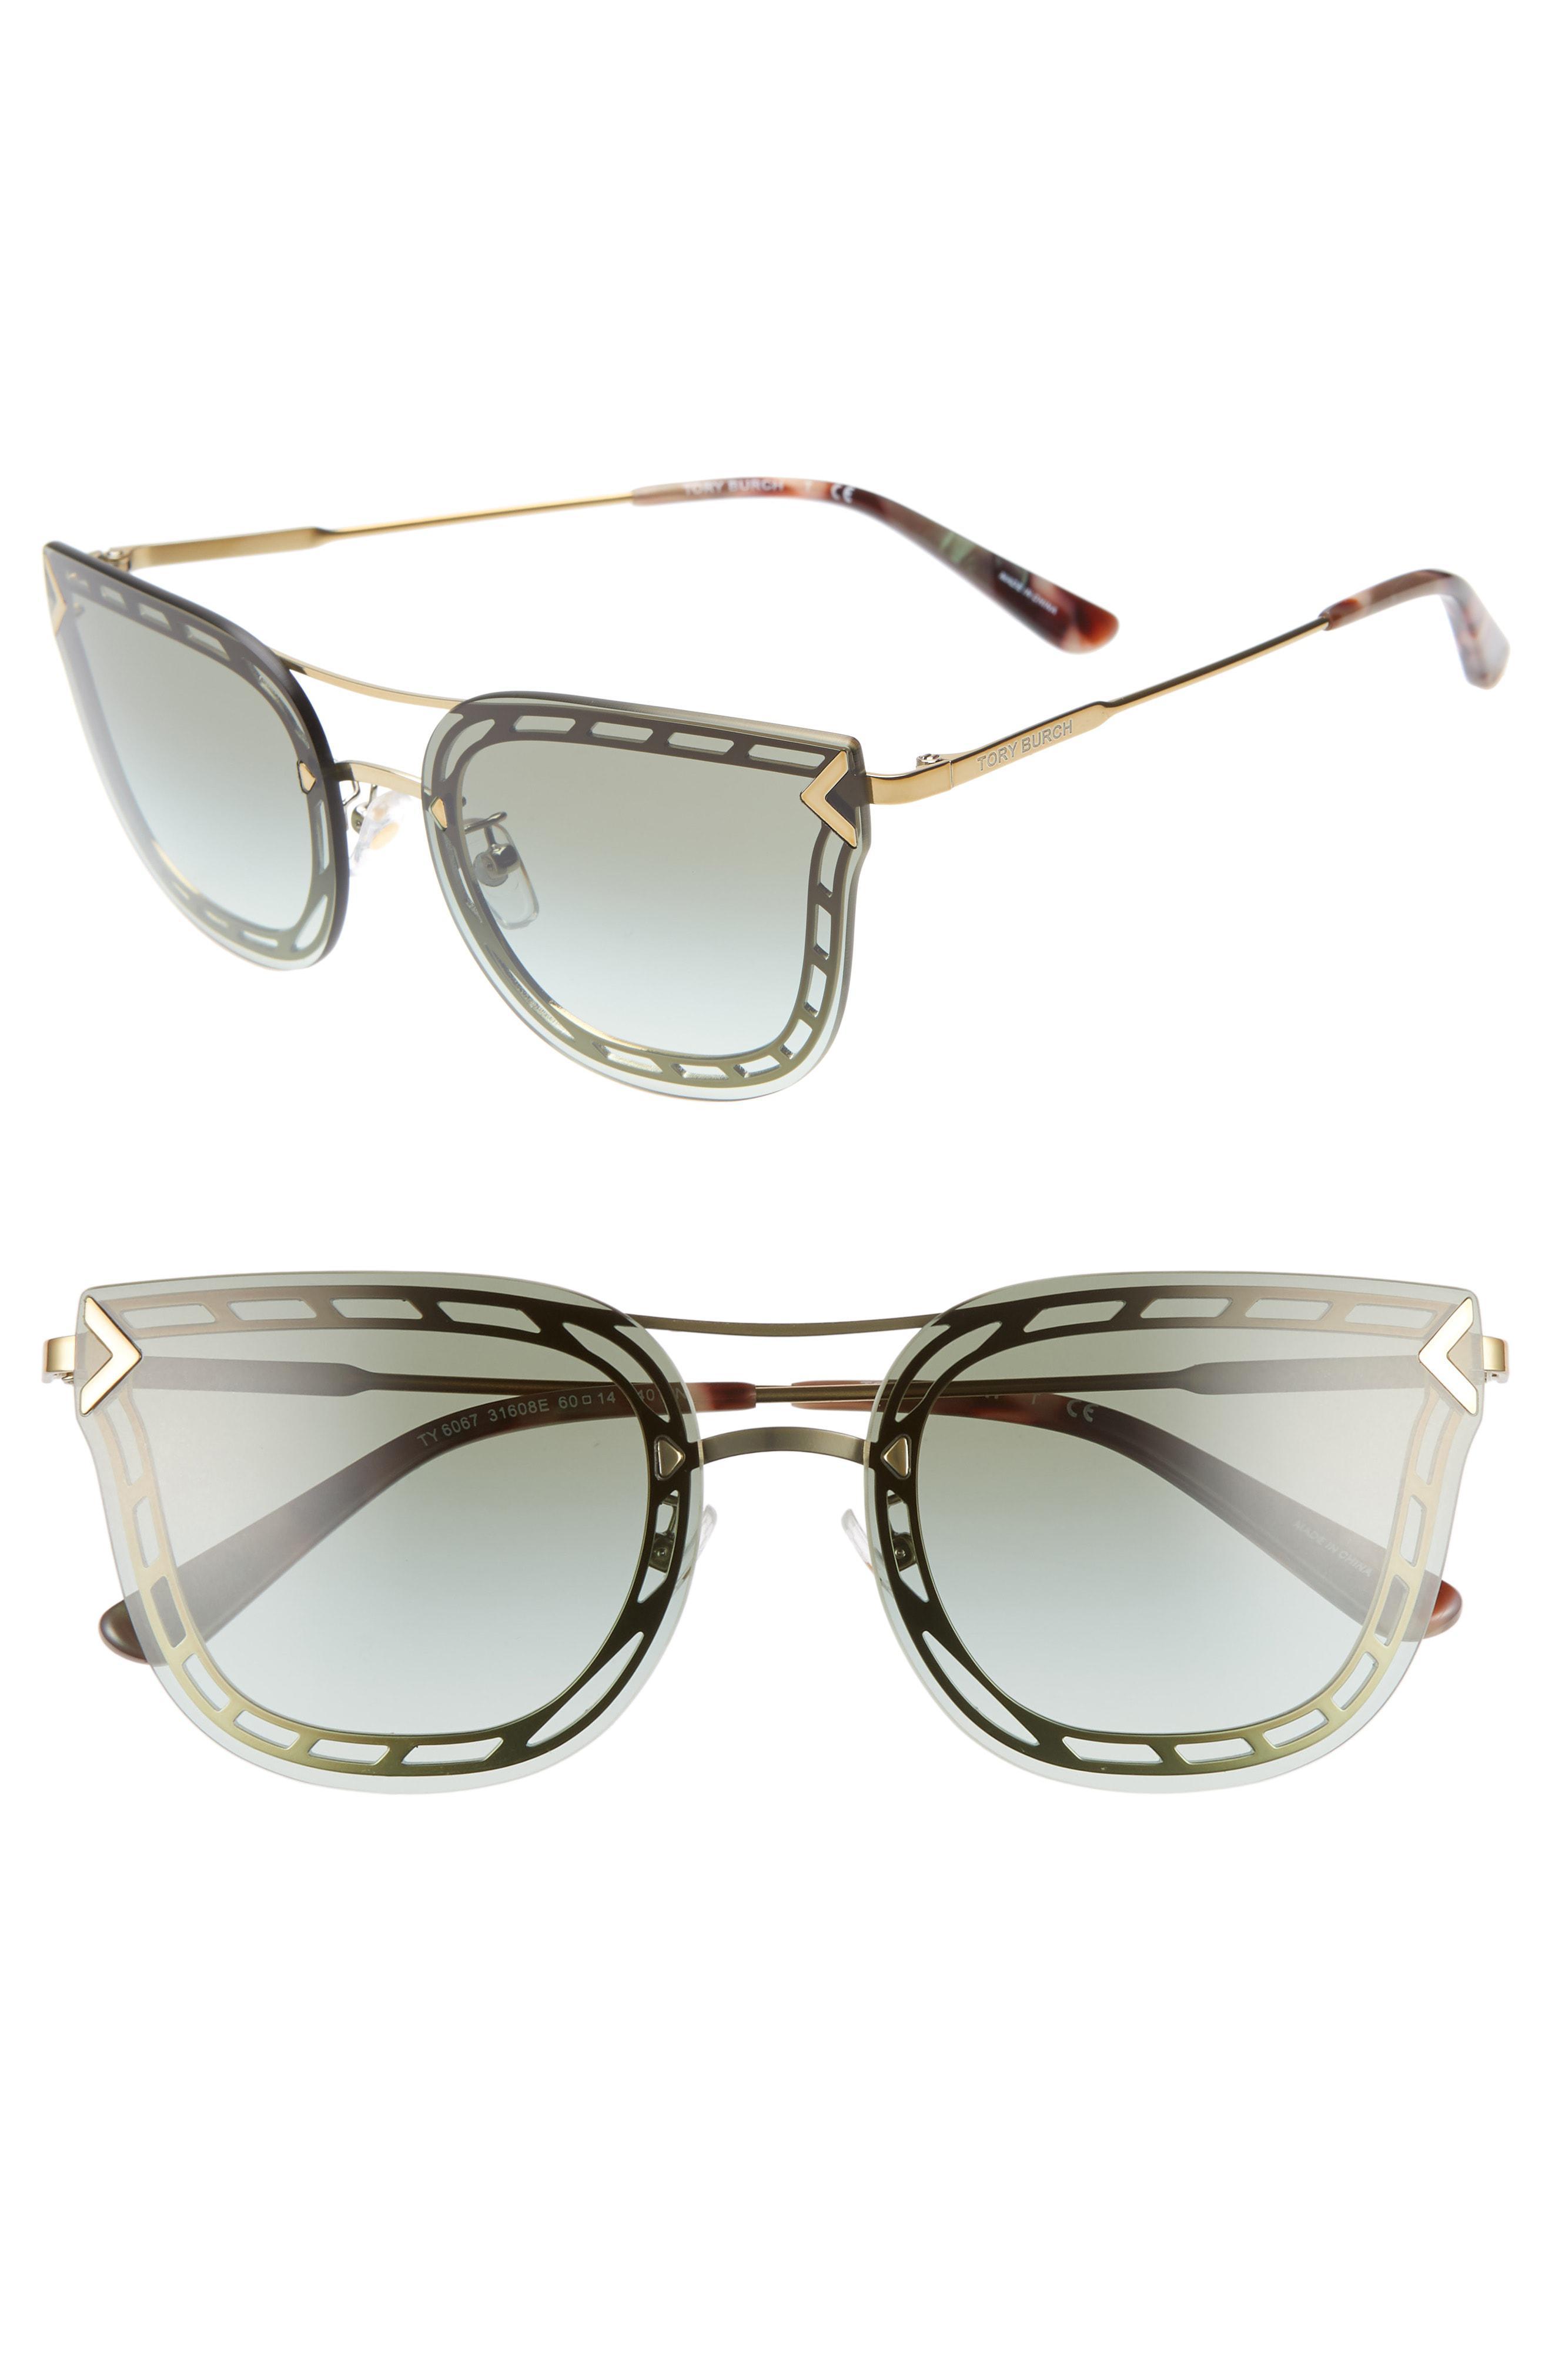 a28e4d1588fb4 Tory Burch - Gray T Wire 60mm Cat Eye Sunglasses - Lyst. View fullscreen